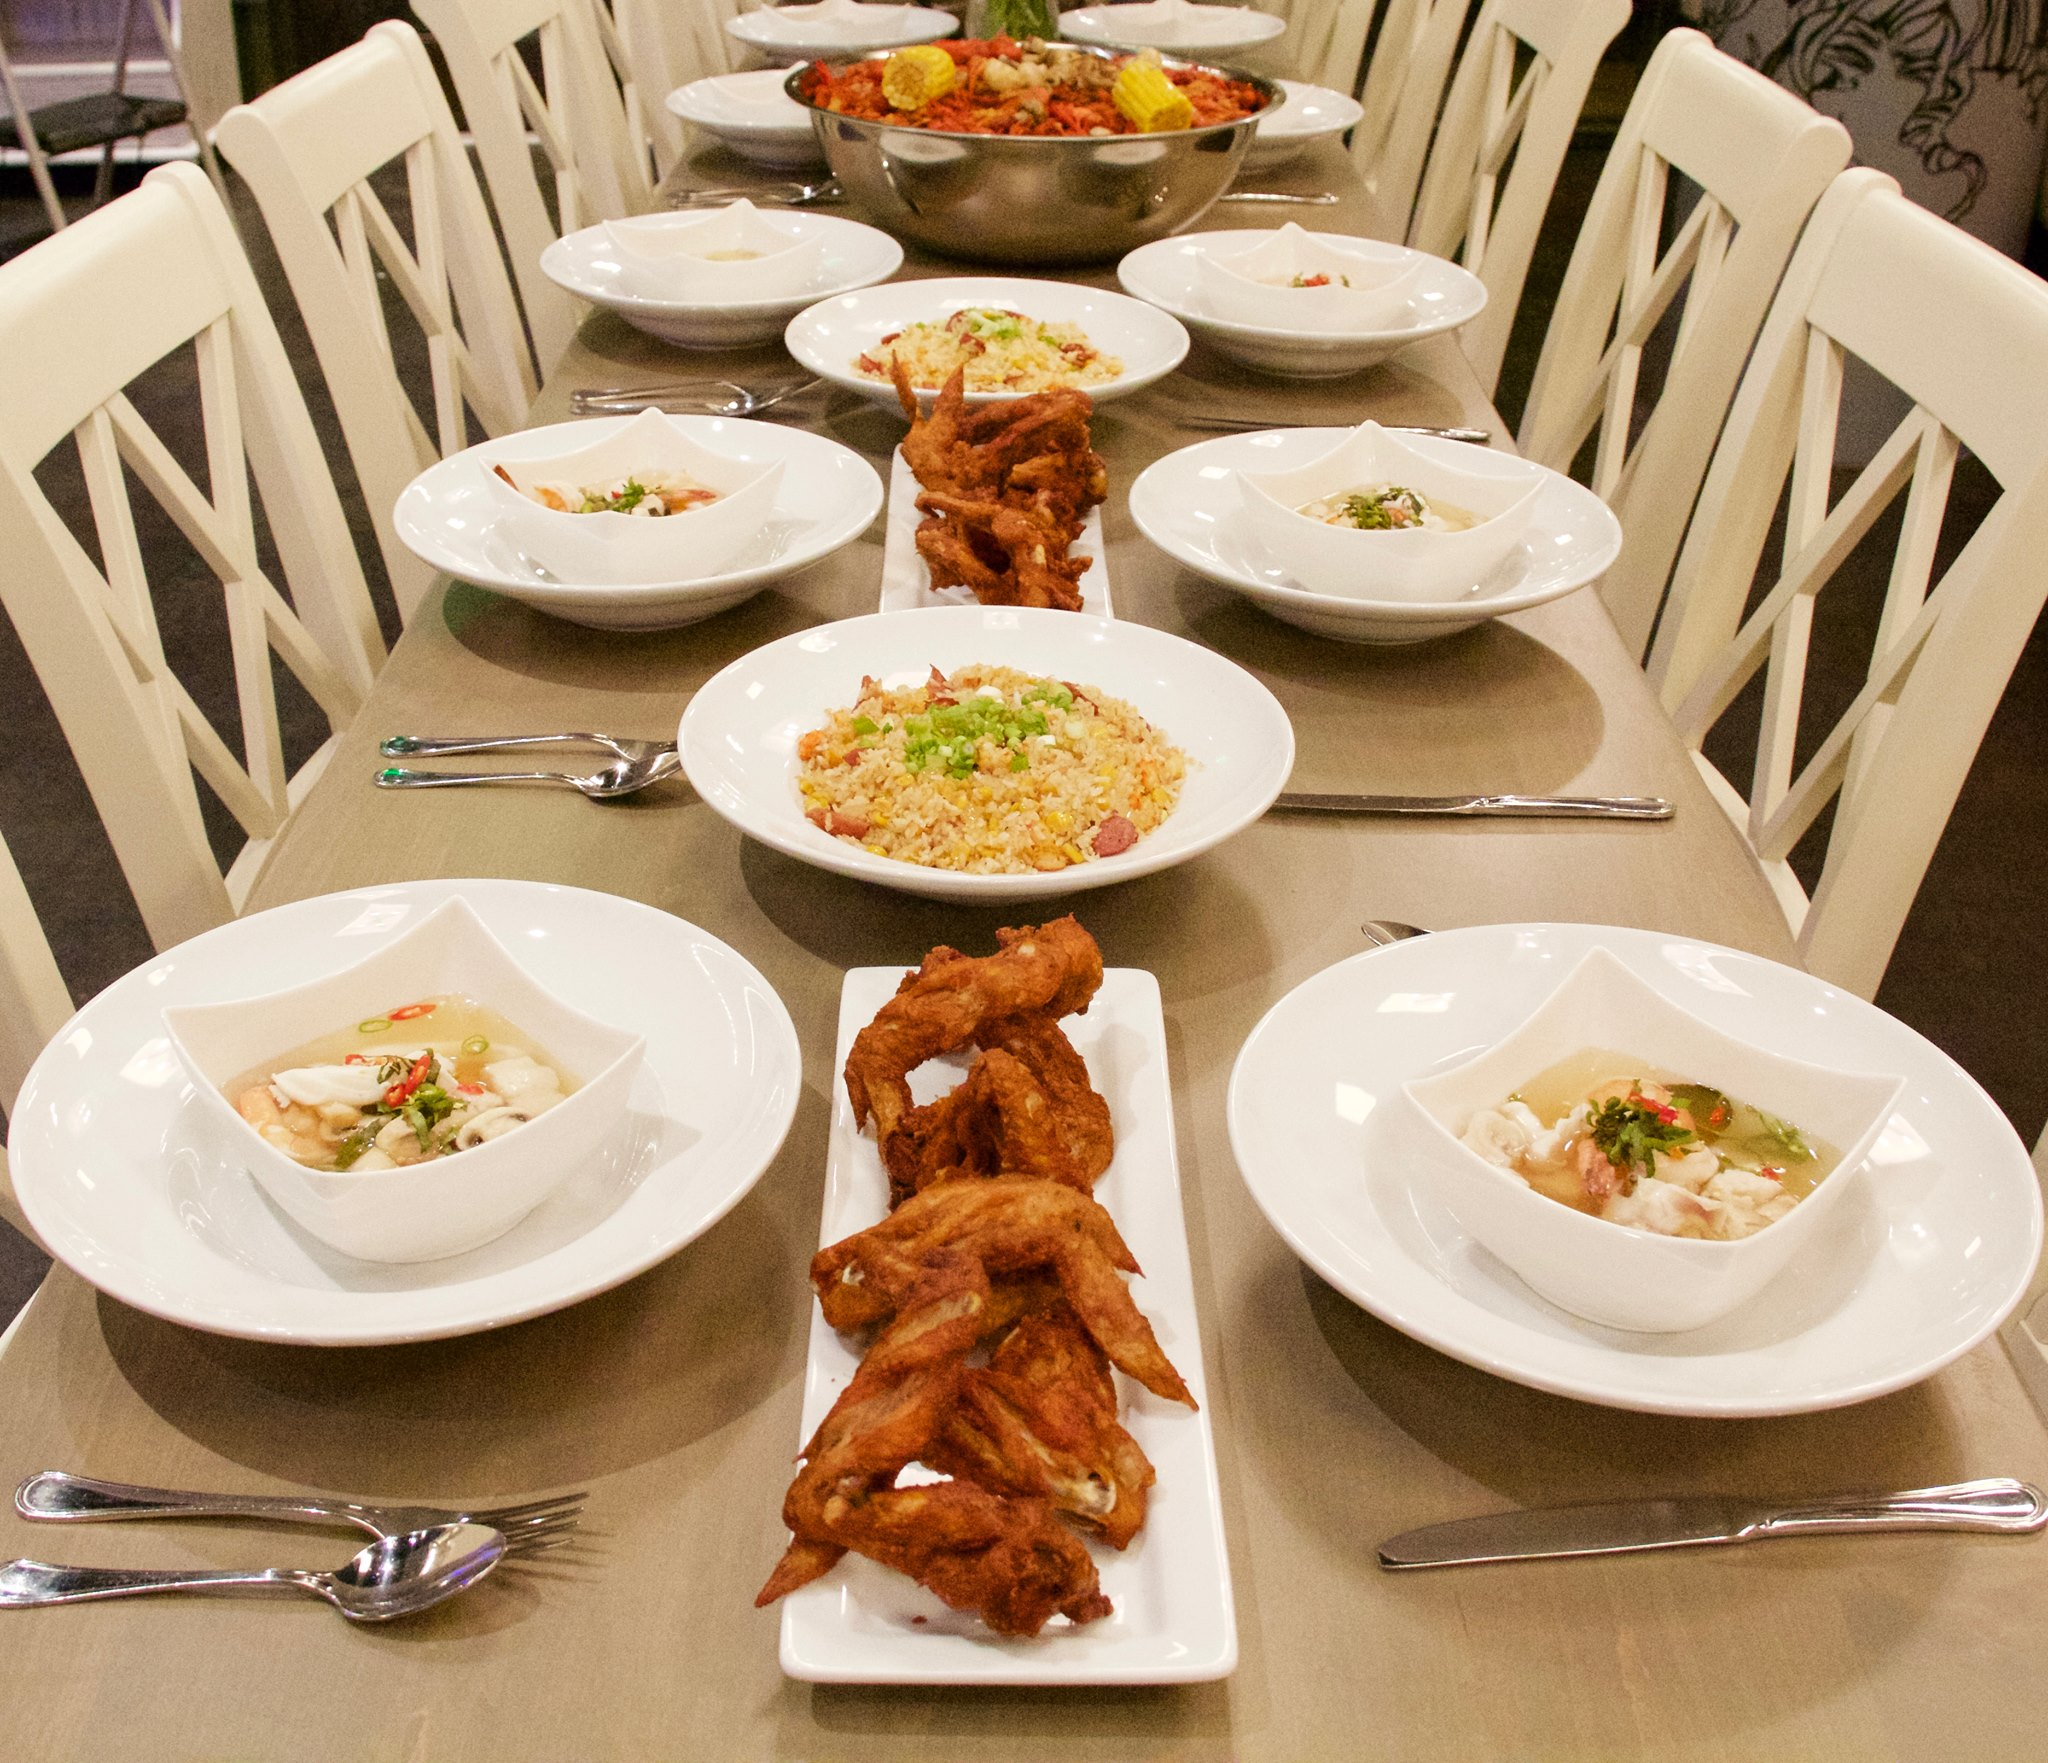 Food from Mandala Kitchen & Bar